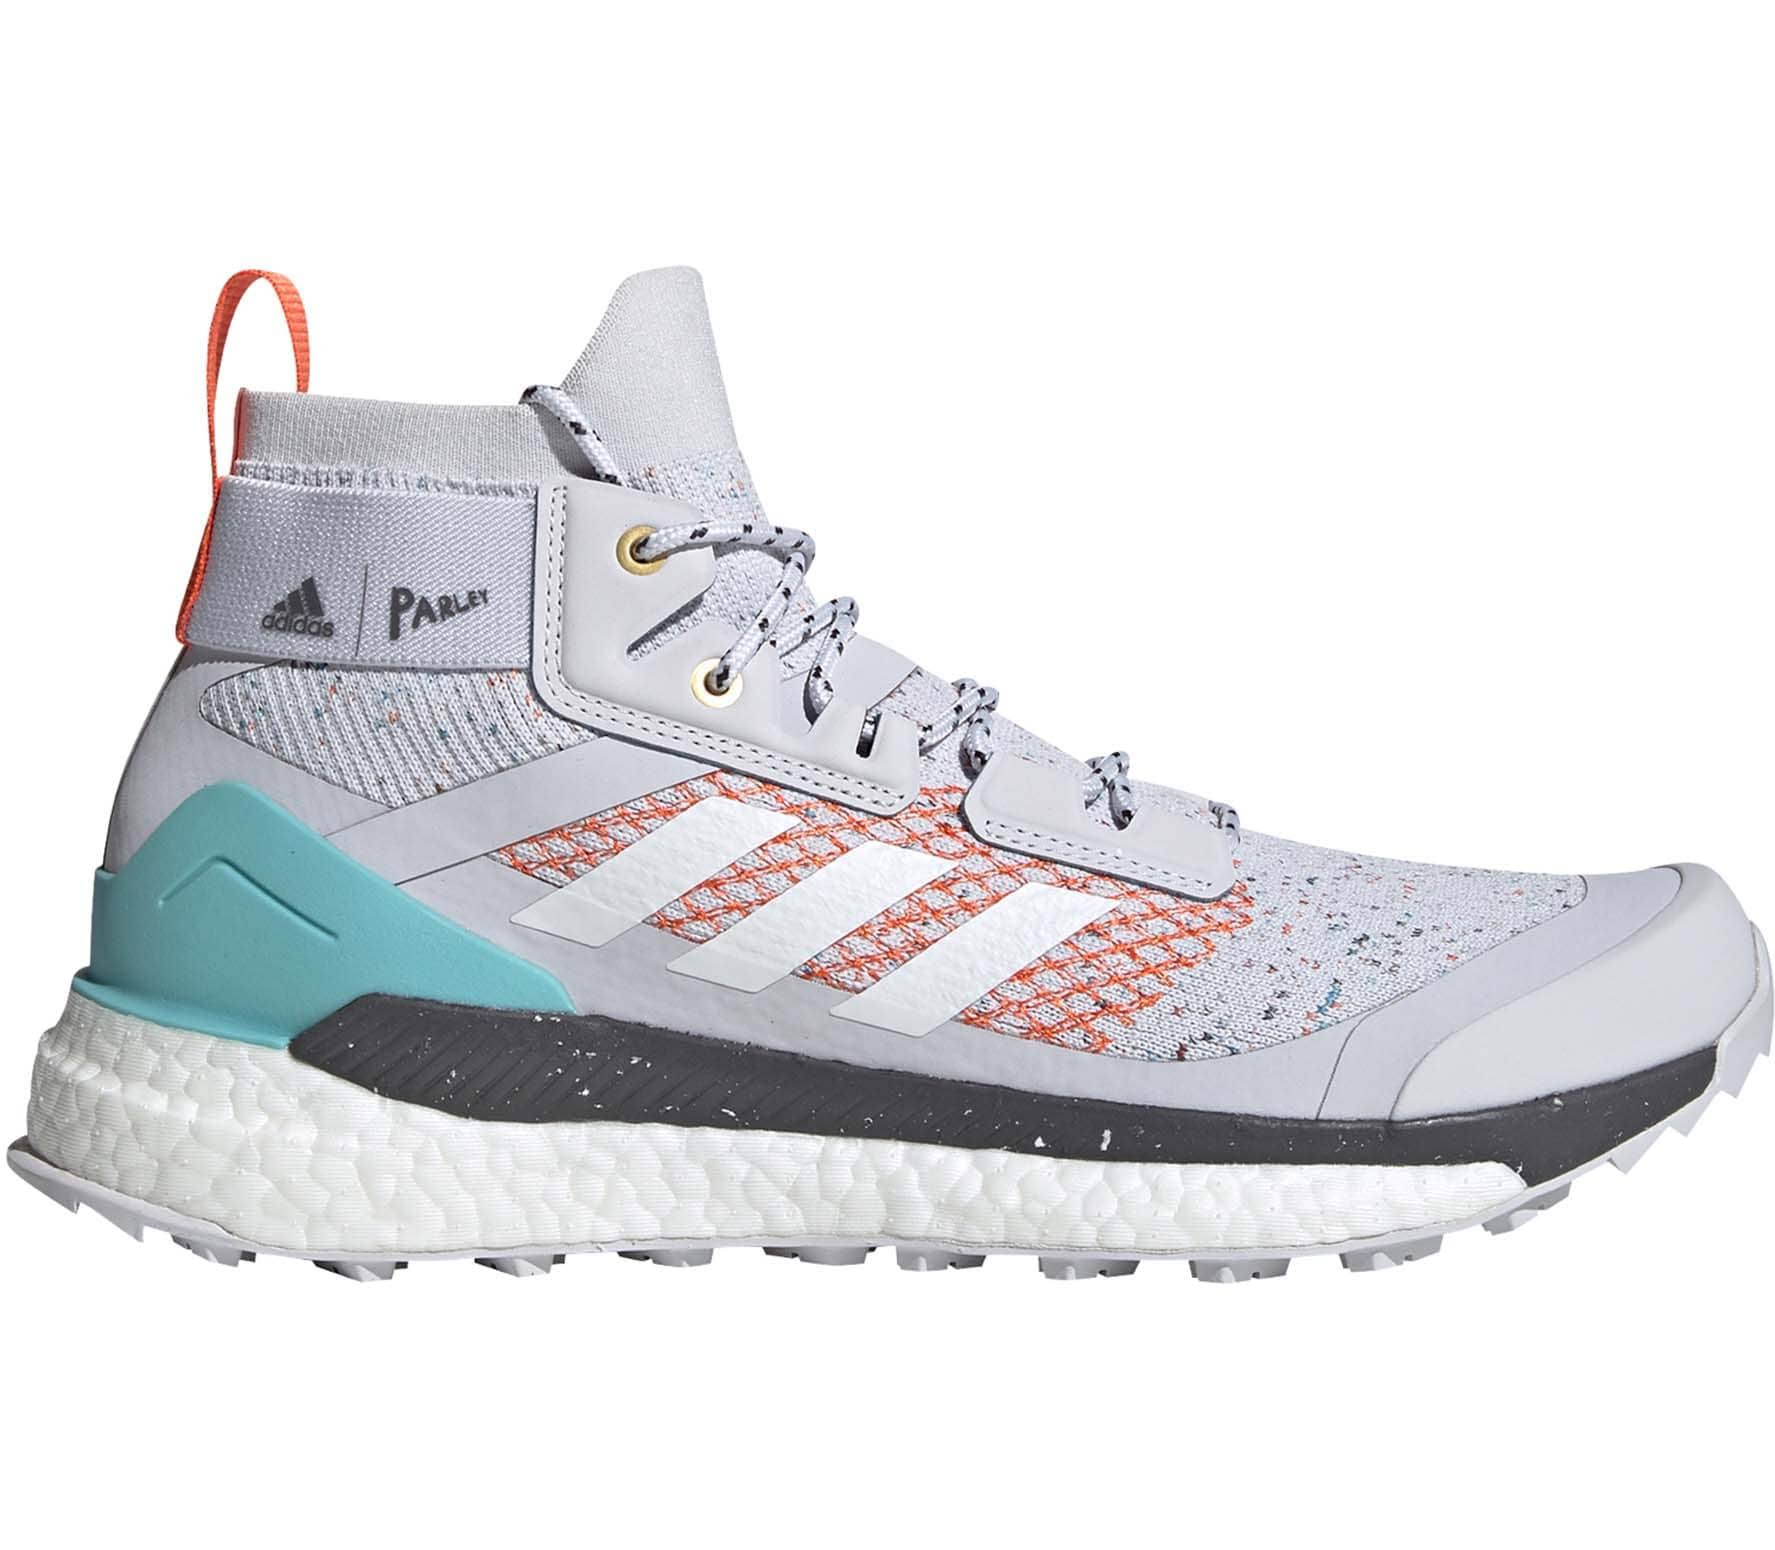 Adidas Terrex Free Hiker Parley Men Hiking Boots Grey